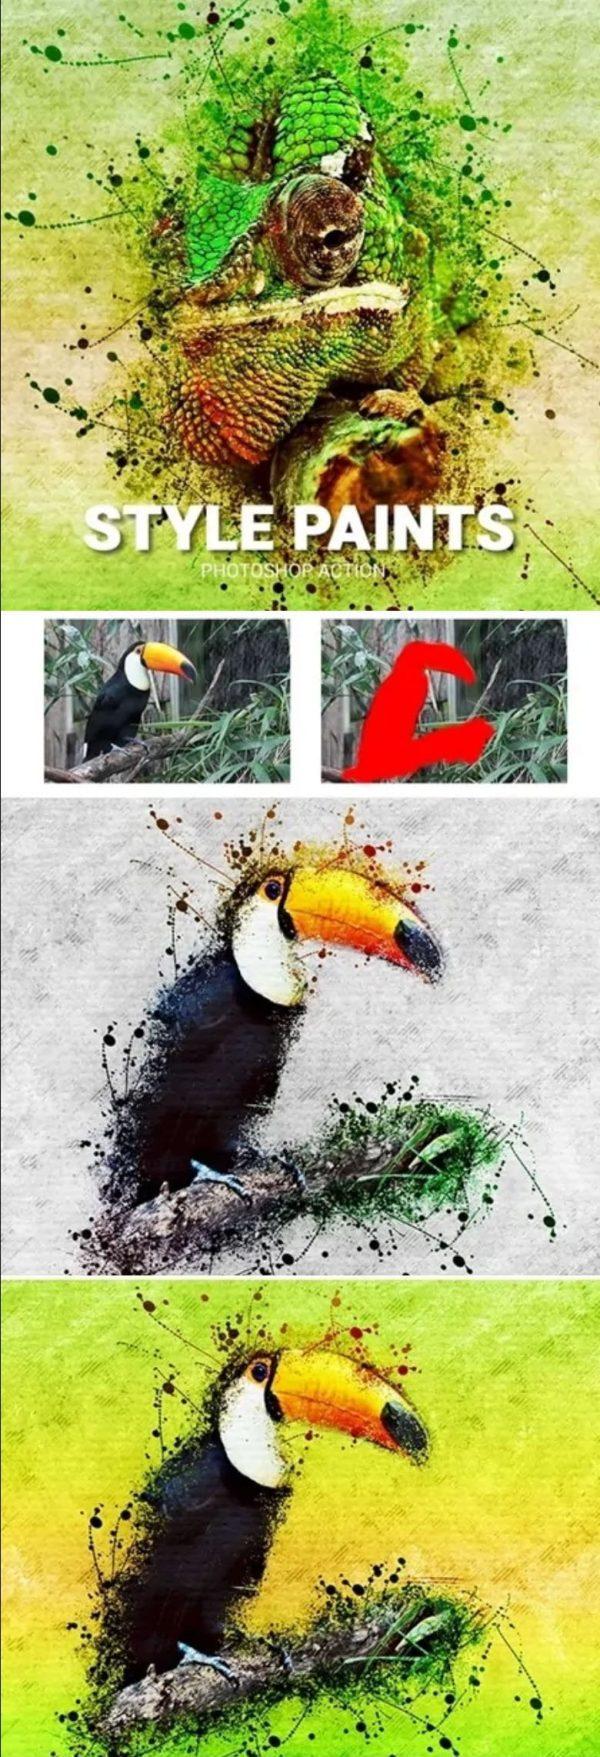 067 Style Paints Photoshop Action 25674415